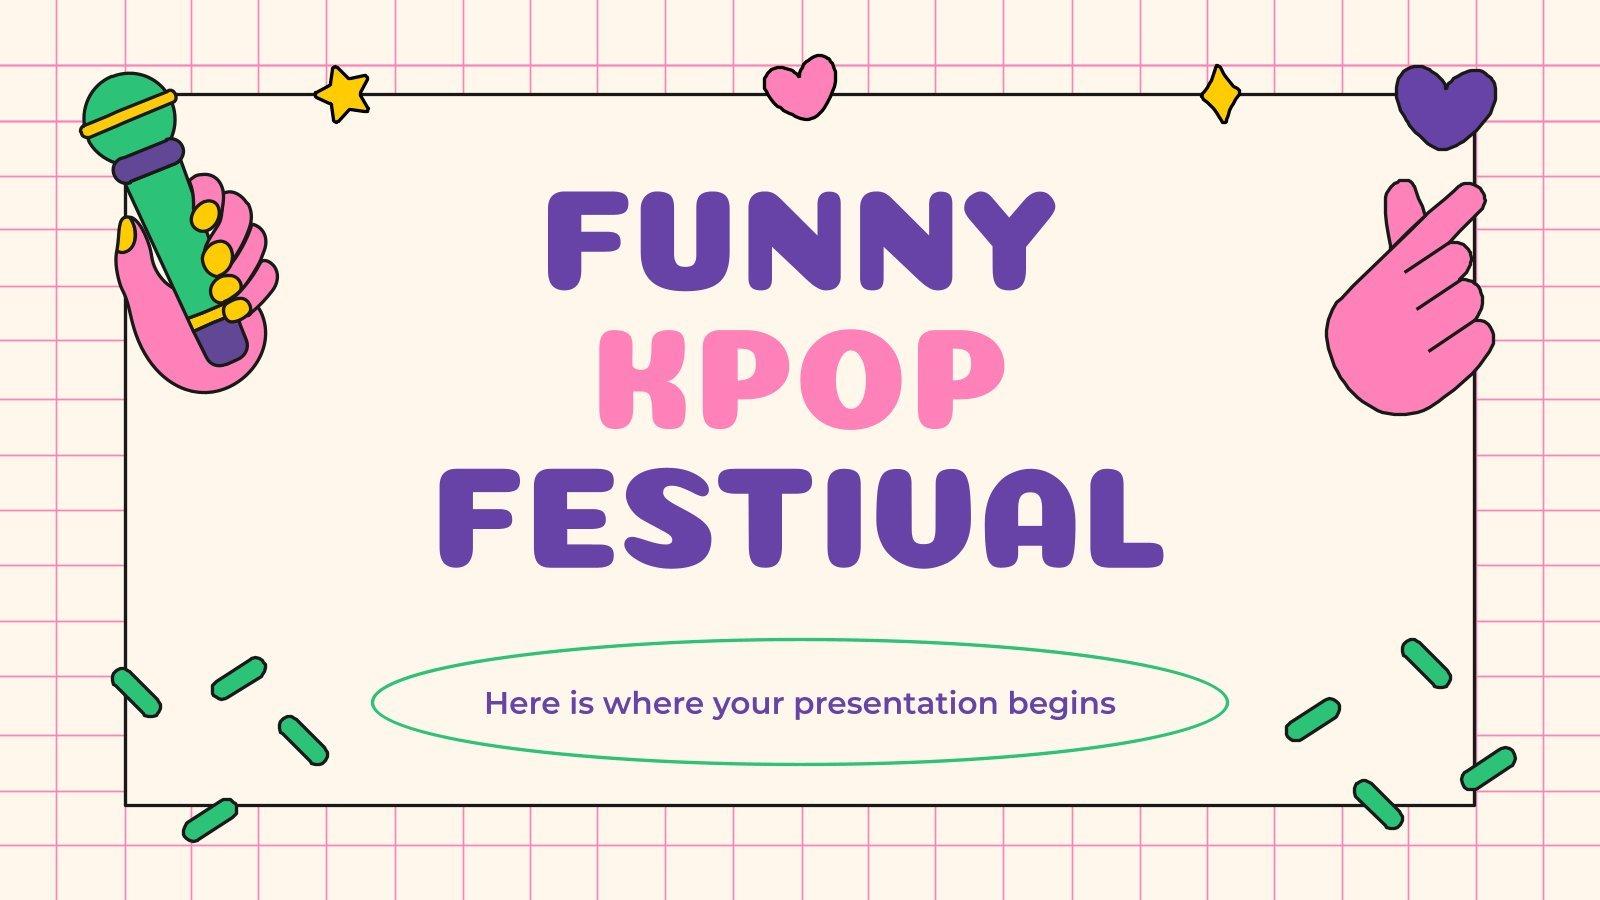 Funny Kpop Festival presentation template